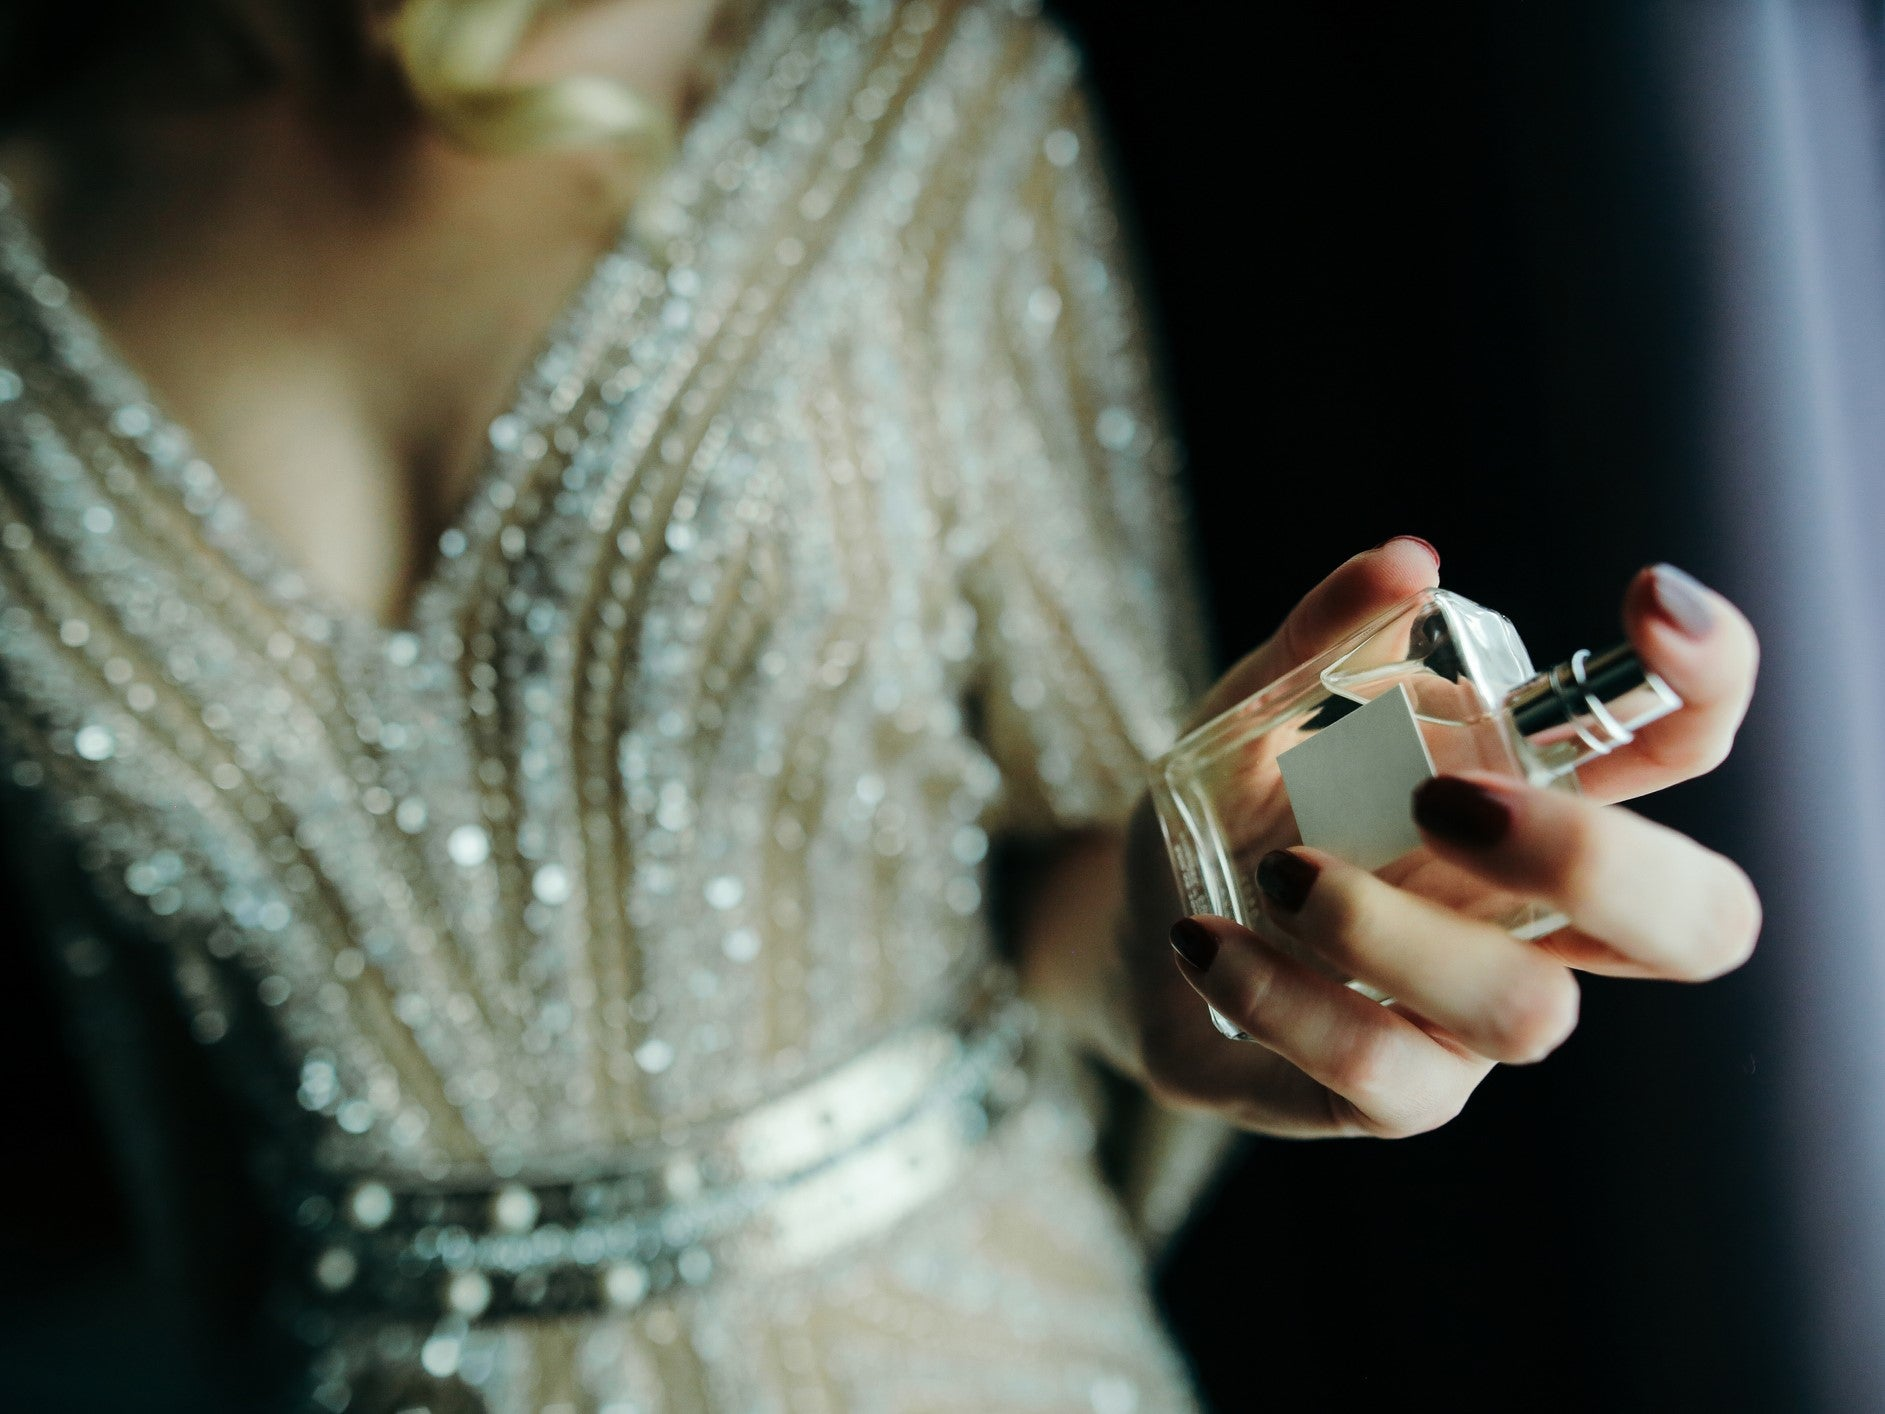 e432ea9ec142 Perfume brand pulls fragrance named  Sexual Harassment